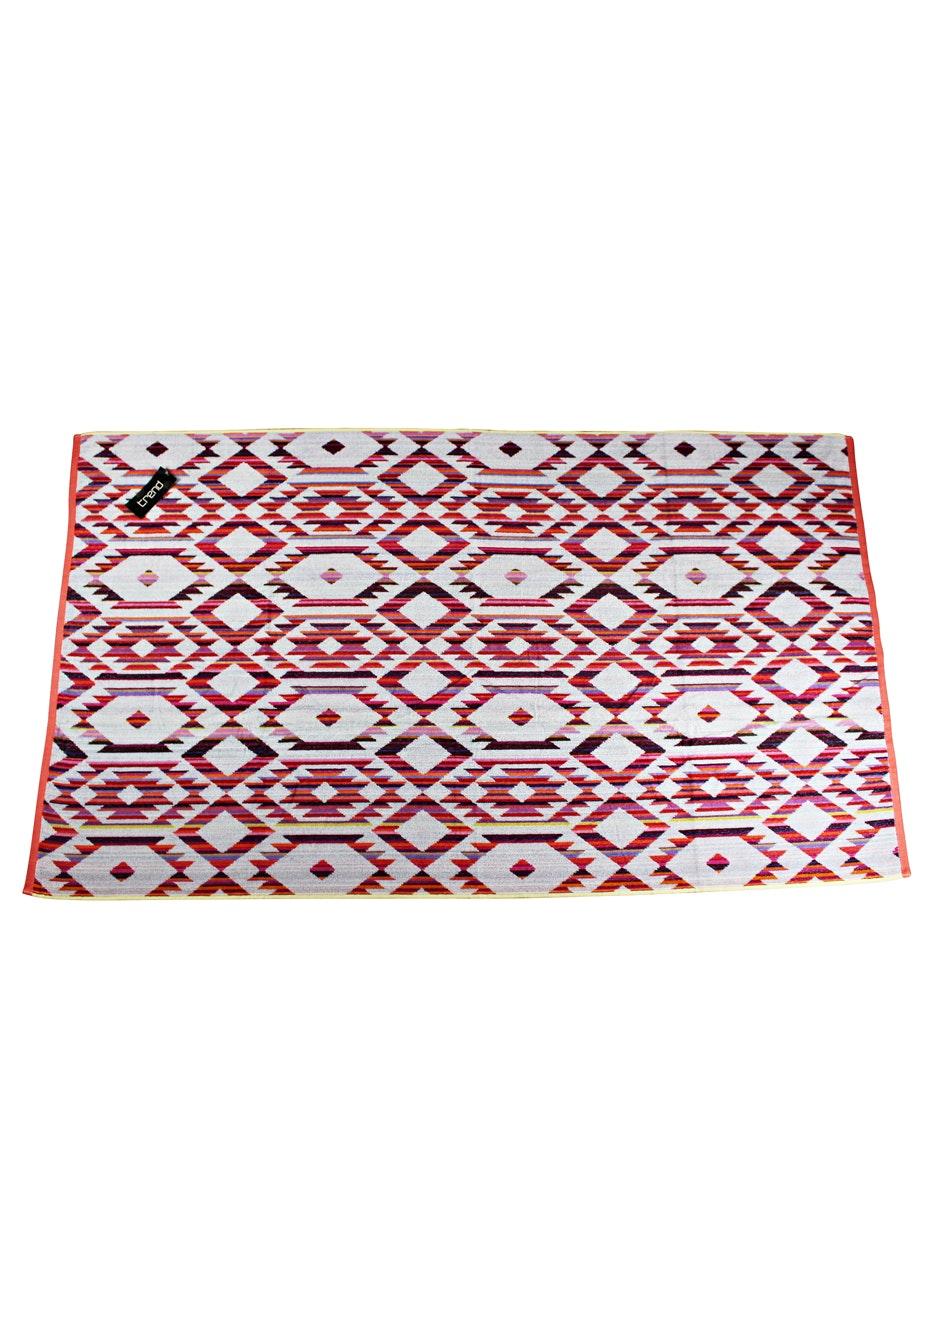 Kuta 100% Cotton Velour Jacquard Beach Towel - 100x180cm